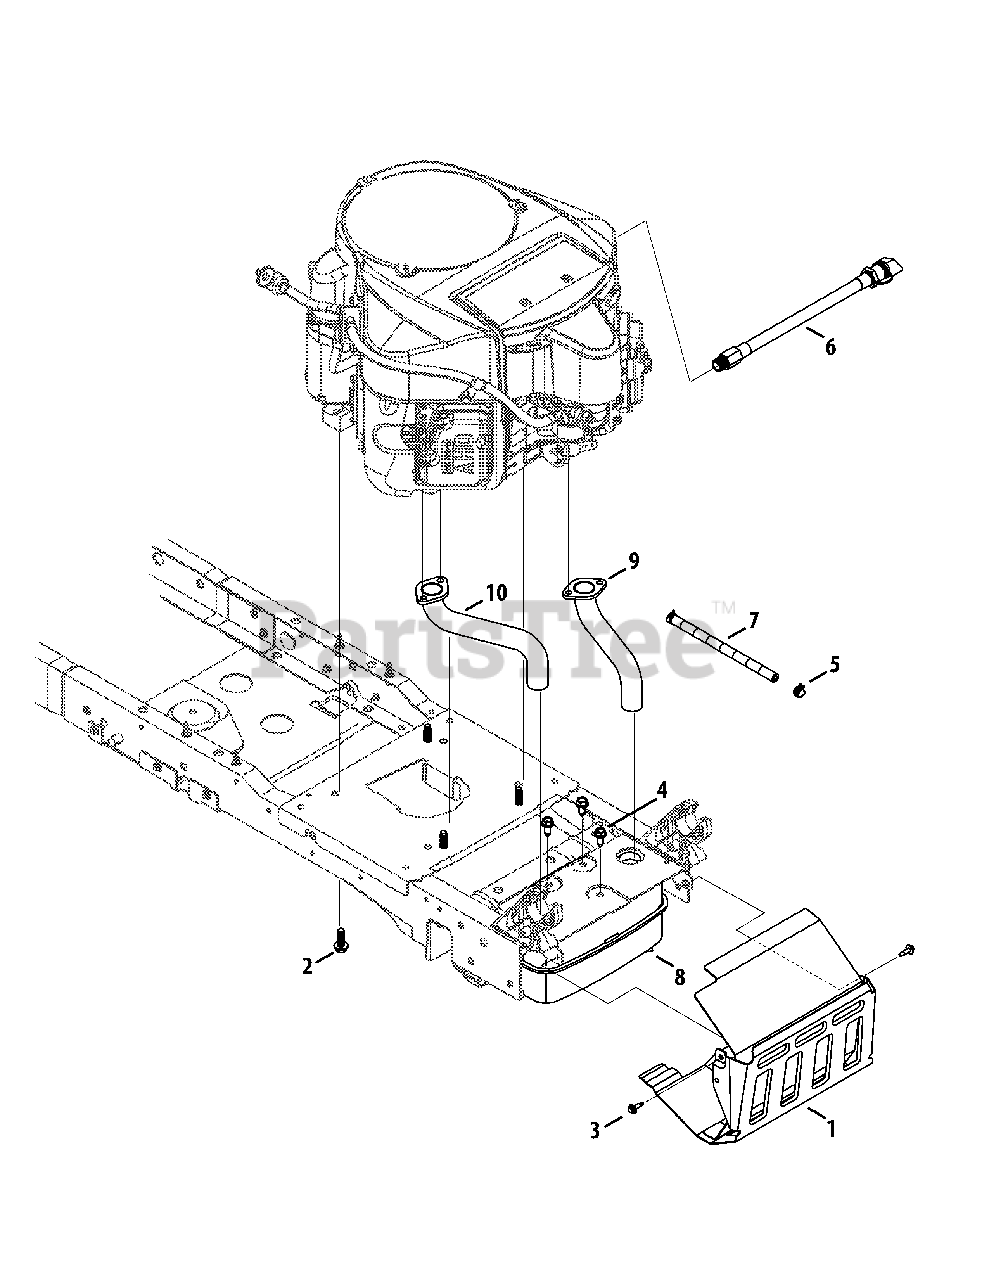 Cub Cadet Engine Diagram -Camper Trailer Wiring Diagram   Begeboy Wiring  Diagram SourceBegeboy Wiring Diagram Source